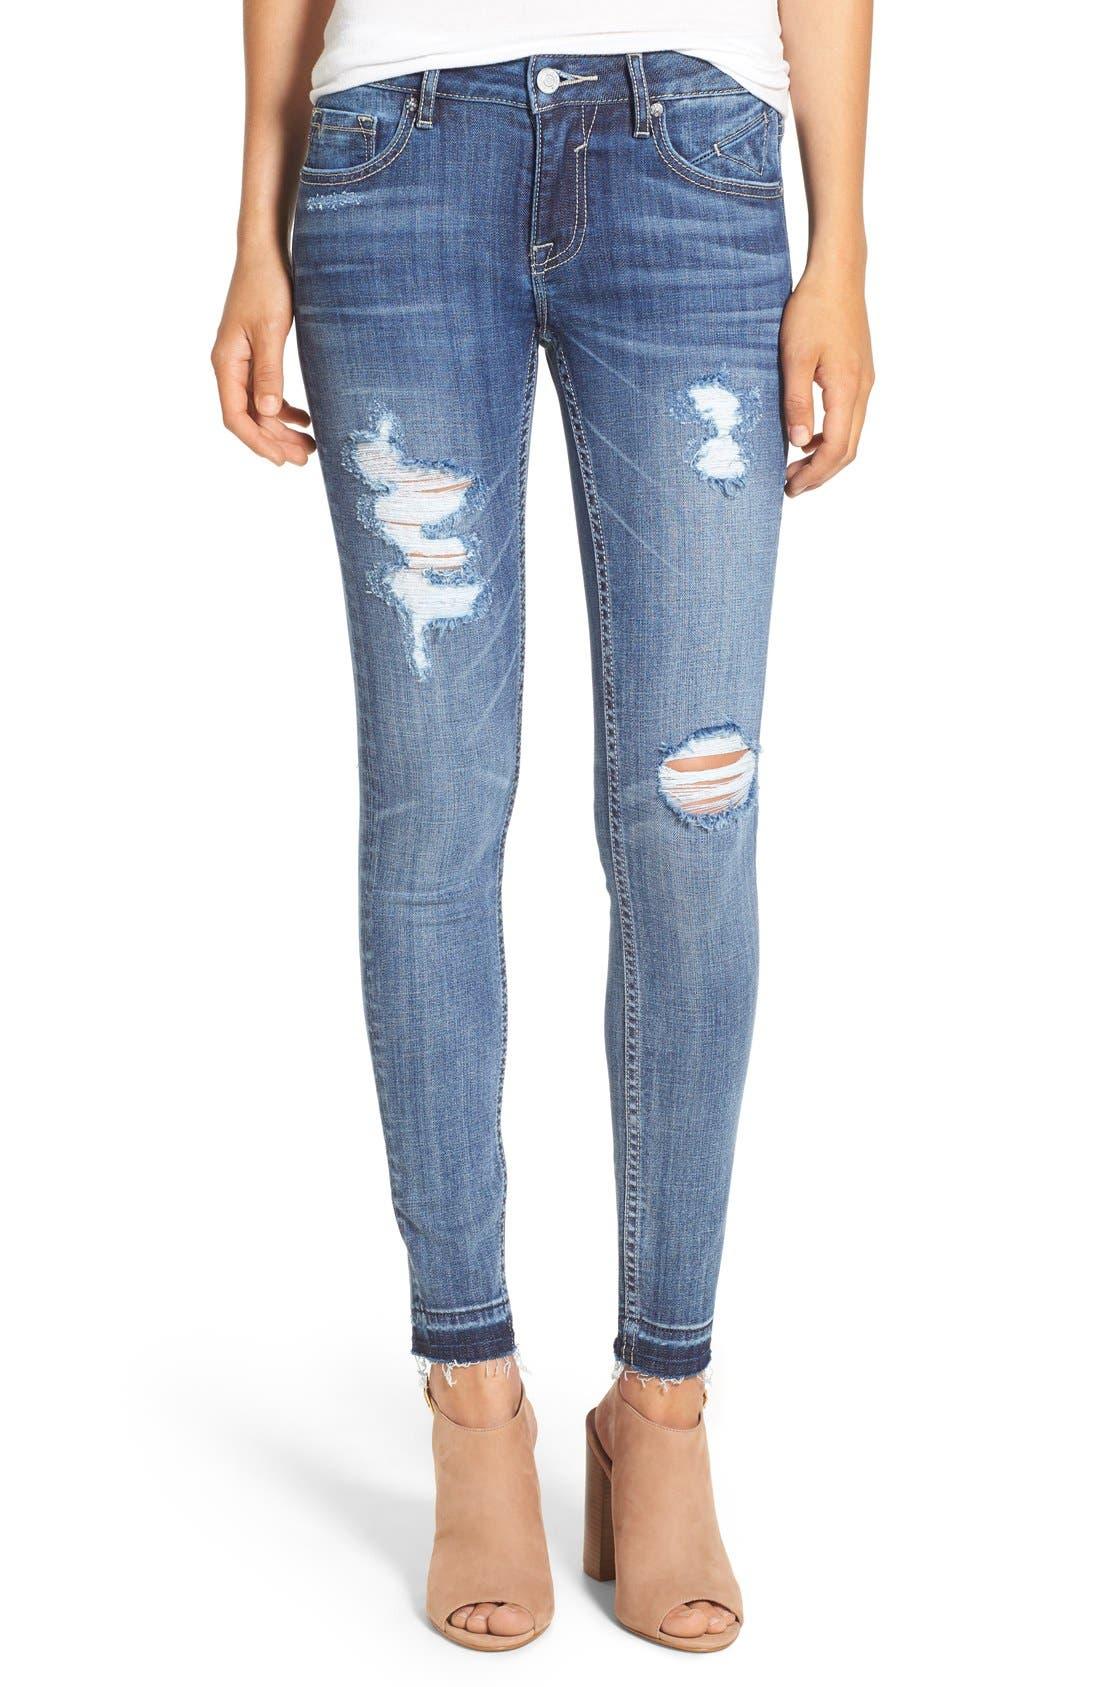 VIGOSS, 'Chelsea' Destroyed Skinny Jeans, Main thumbnail 1, color, 400